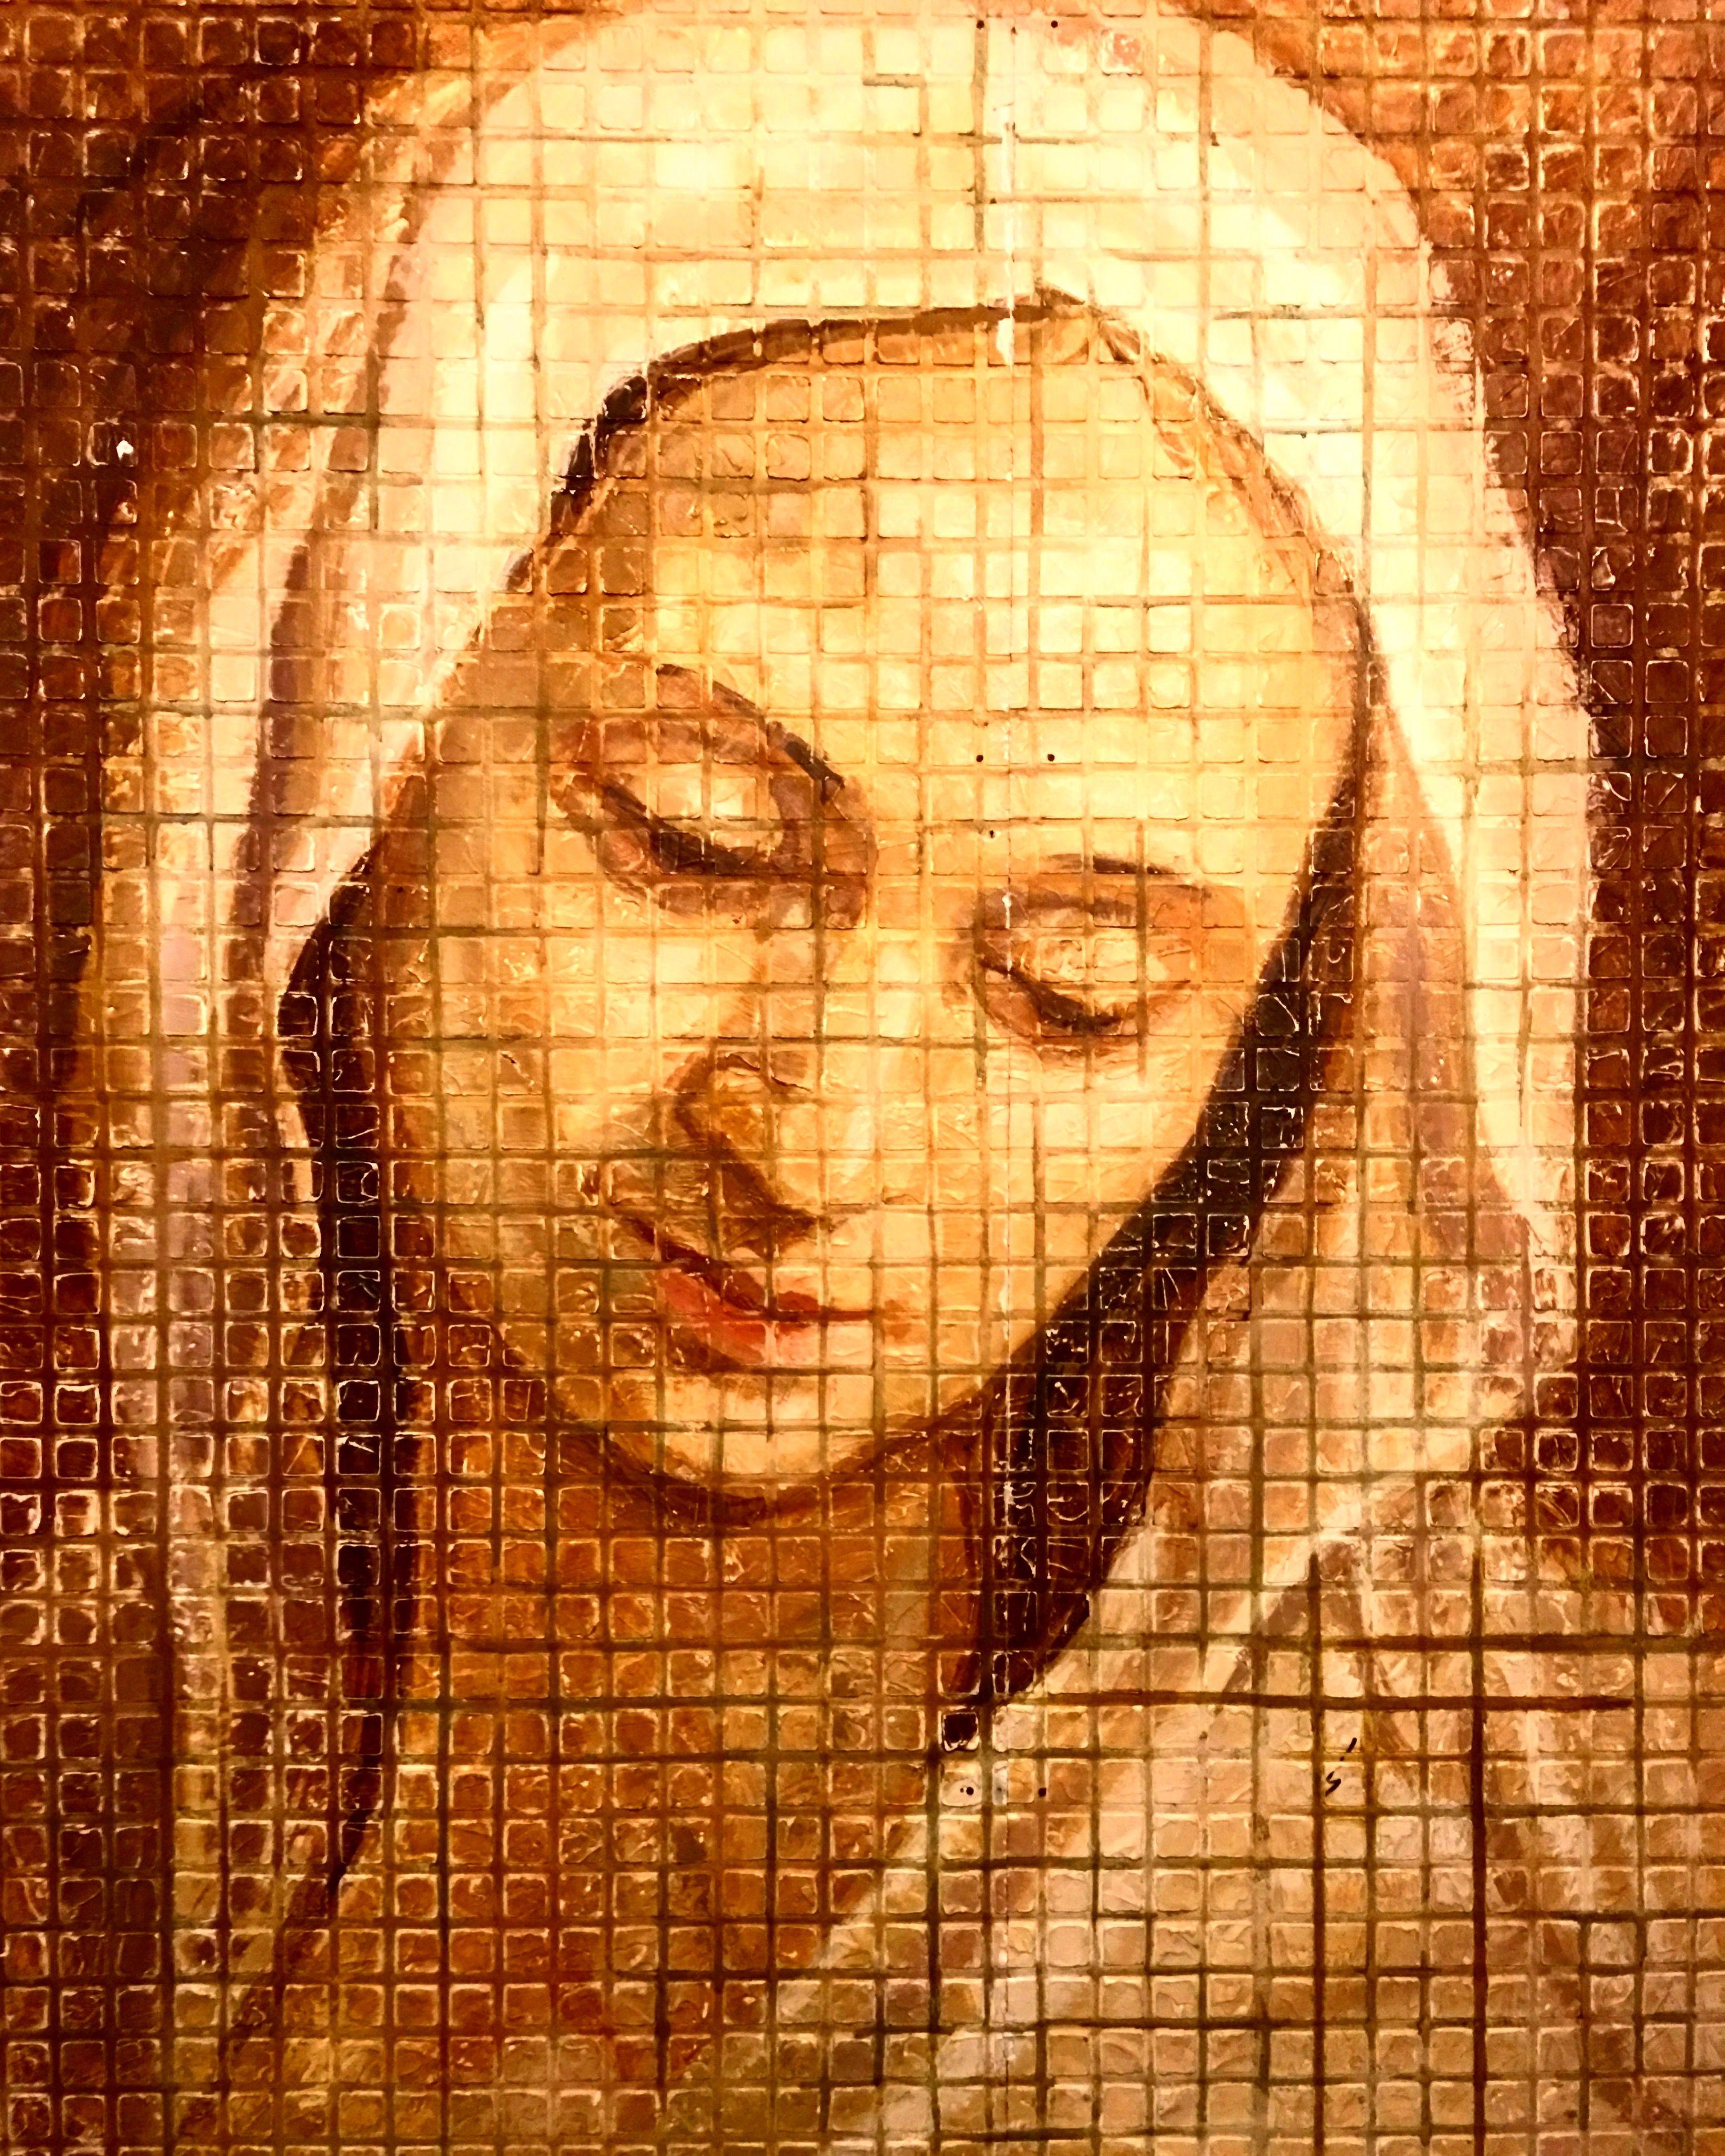 Outstanding Virgin Mary Wall Art Illustration - The Wall Art ...